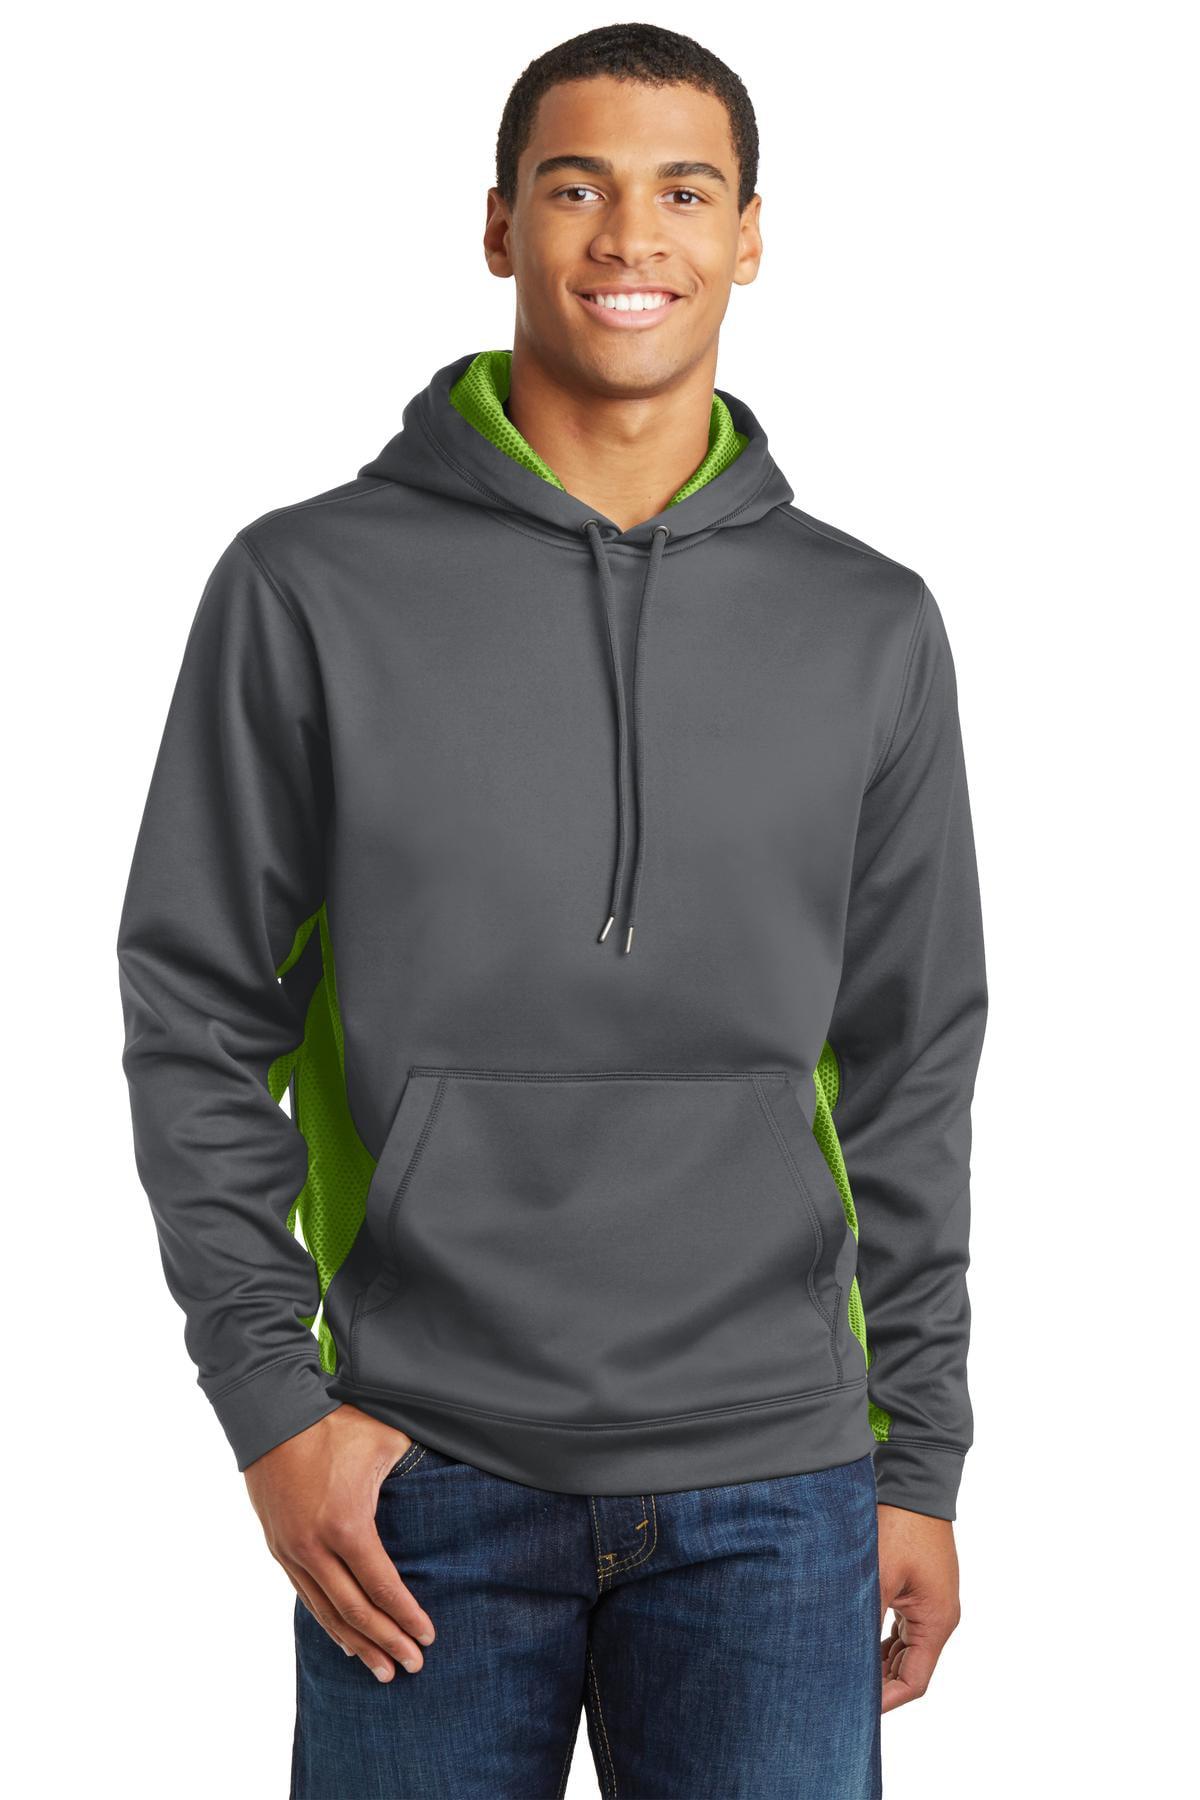 Sport-Tek Sport-Wick CamoHex Fleece Colorblock Hooded Pullover